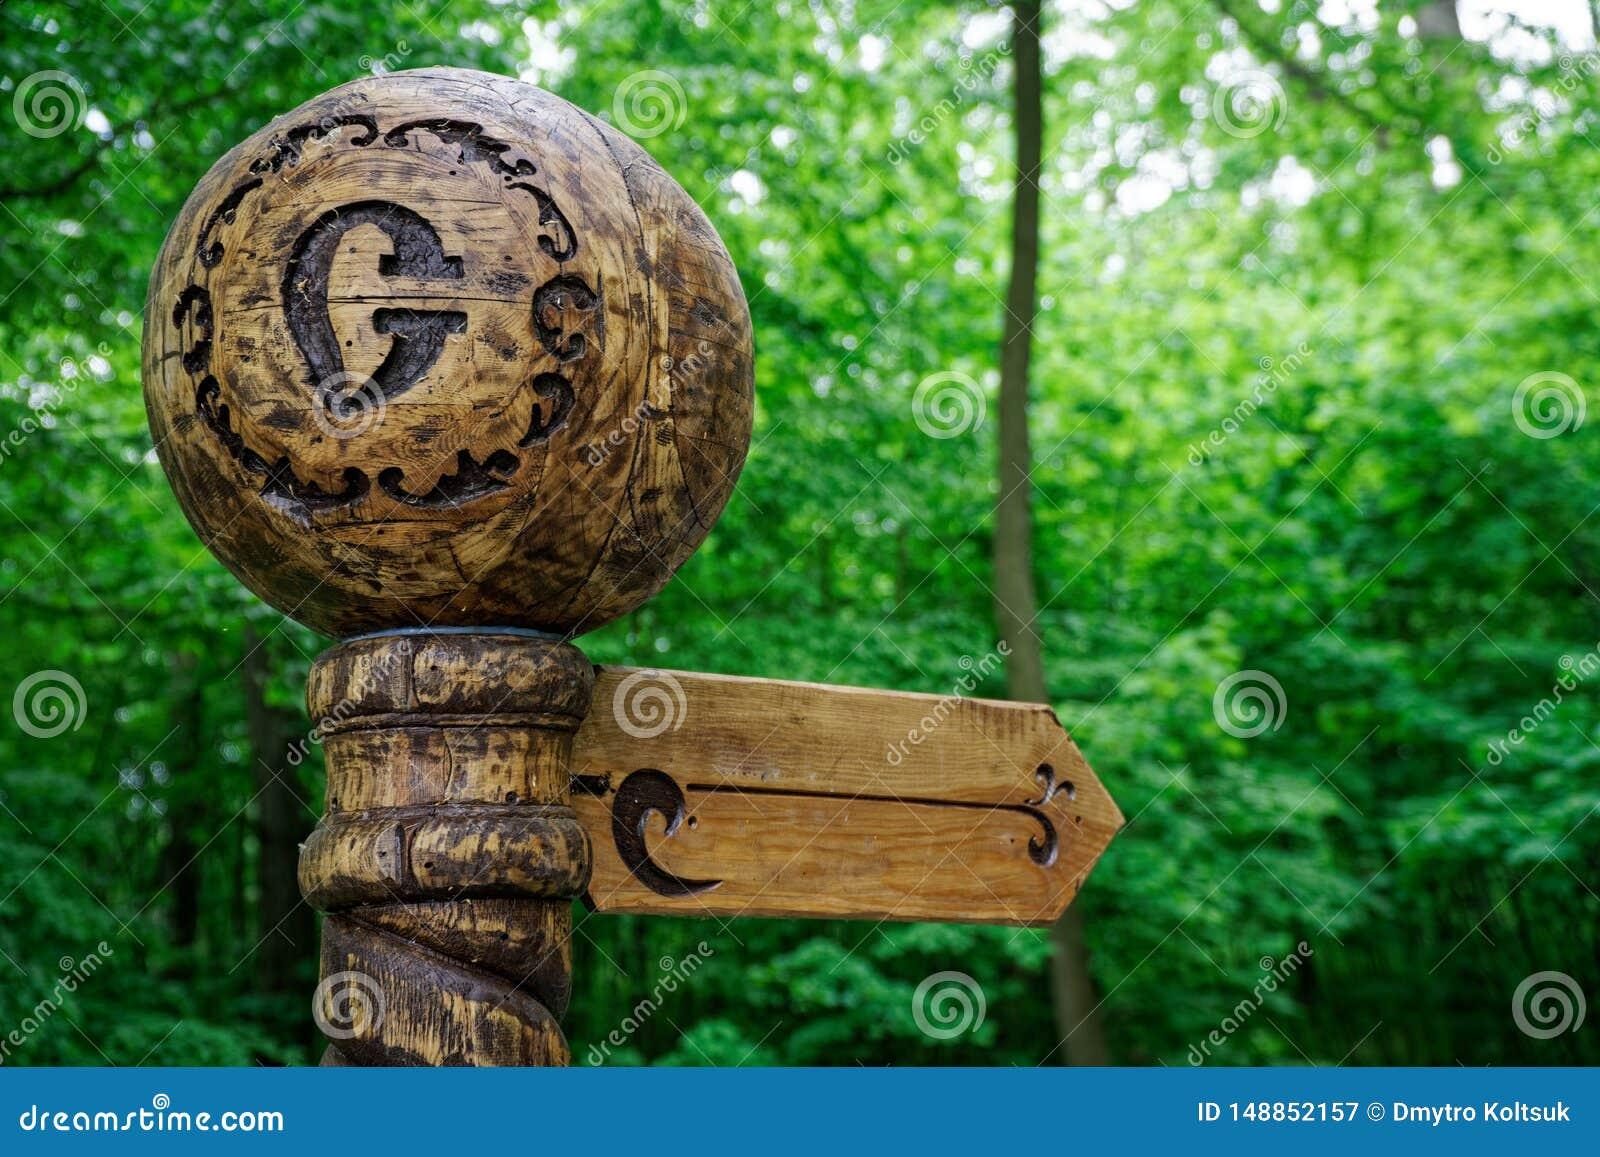 Direcci?n de madera decorativa de la ruta o de la trayectoria, manera a la felicidad